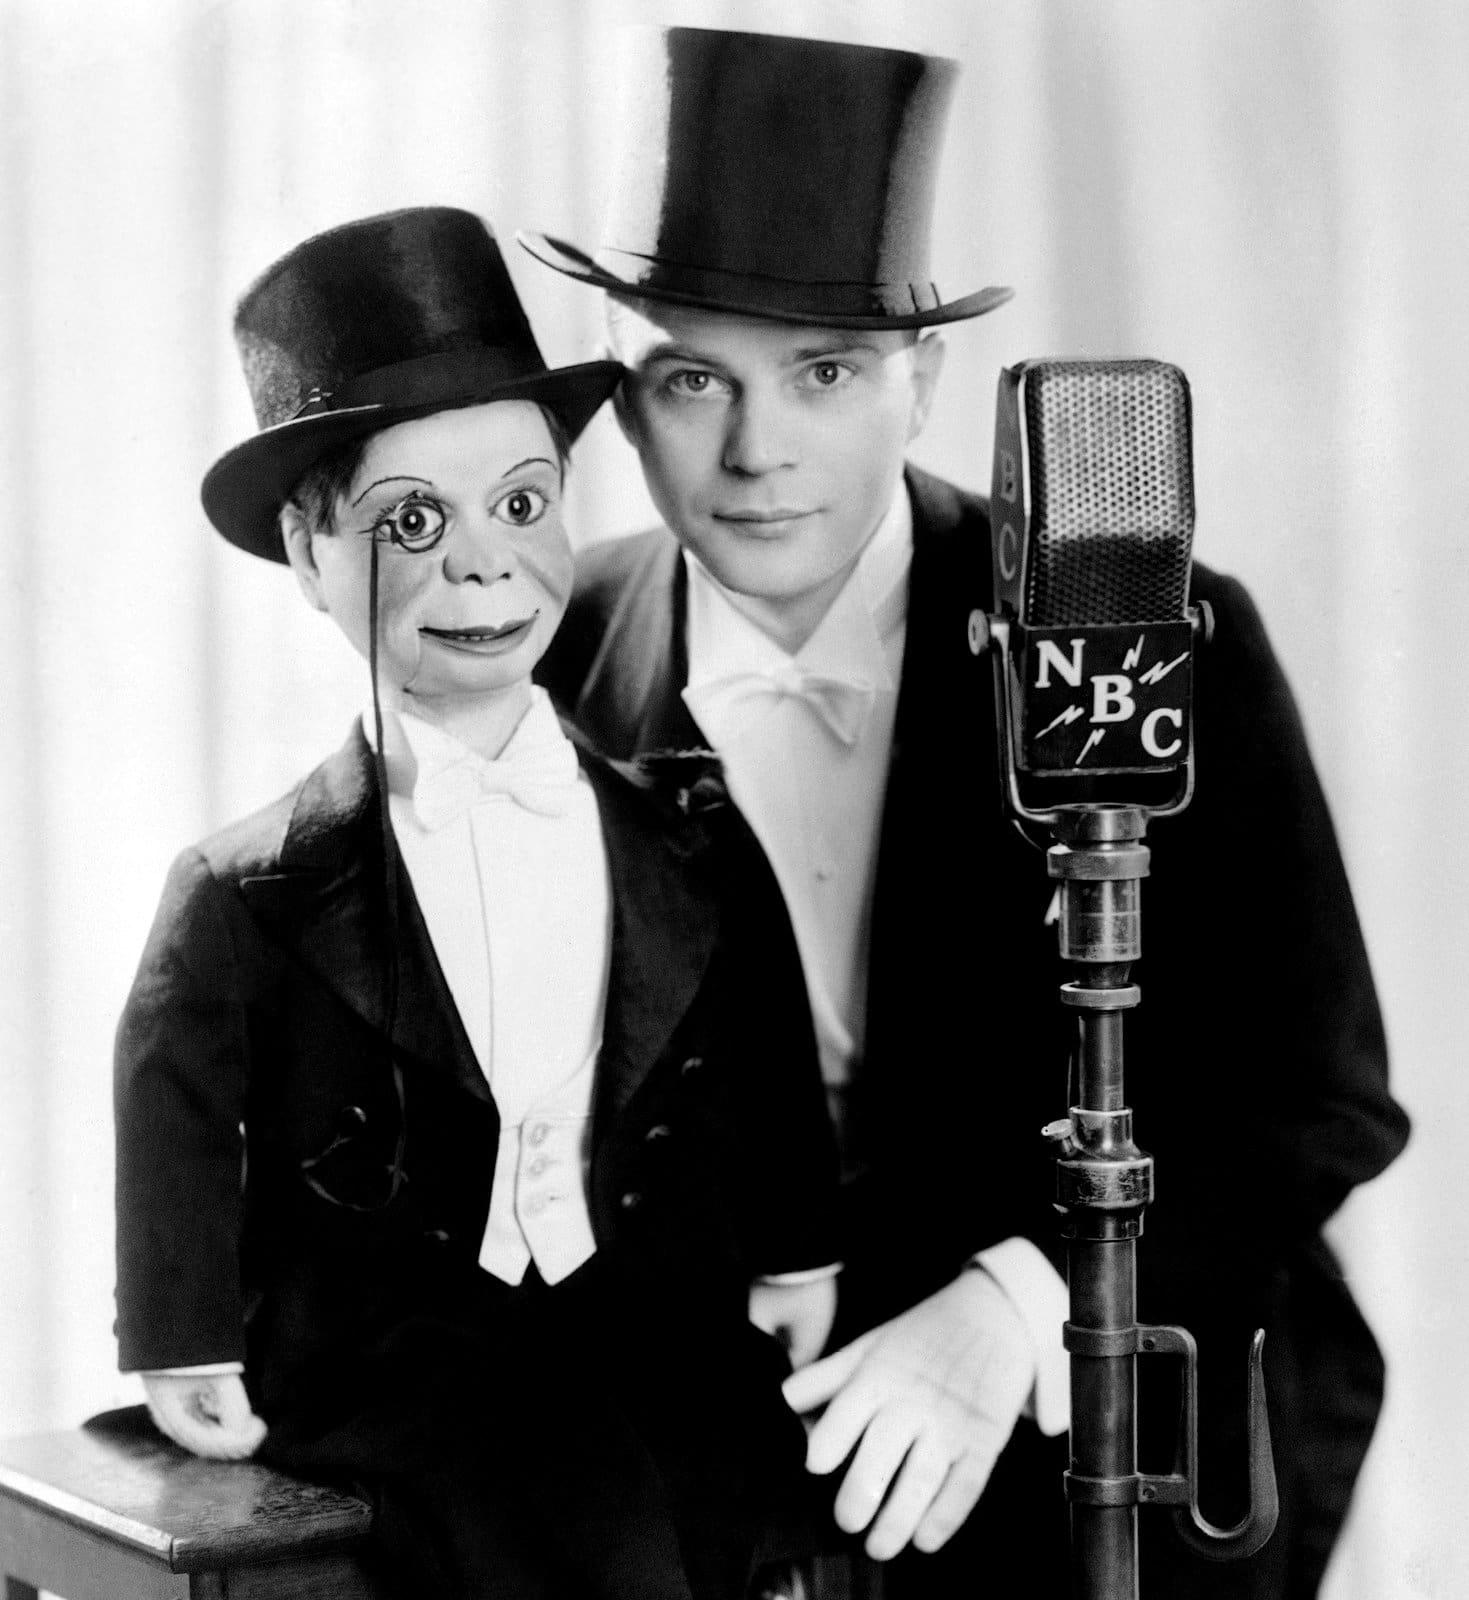 Edgar Bergen NBC radio show